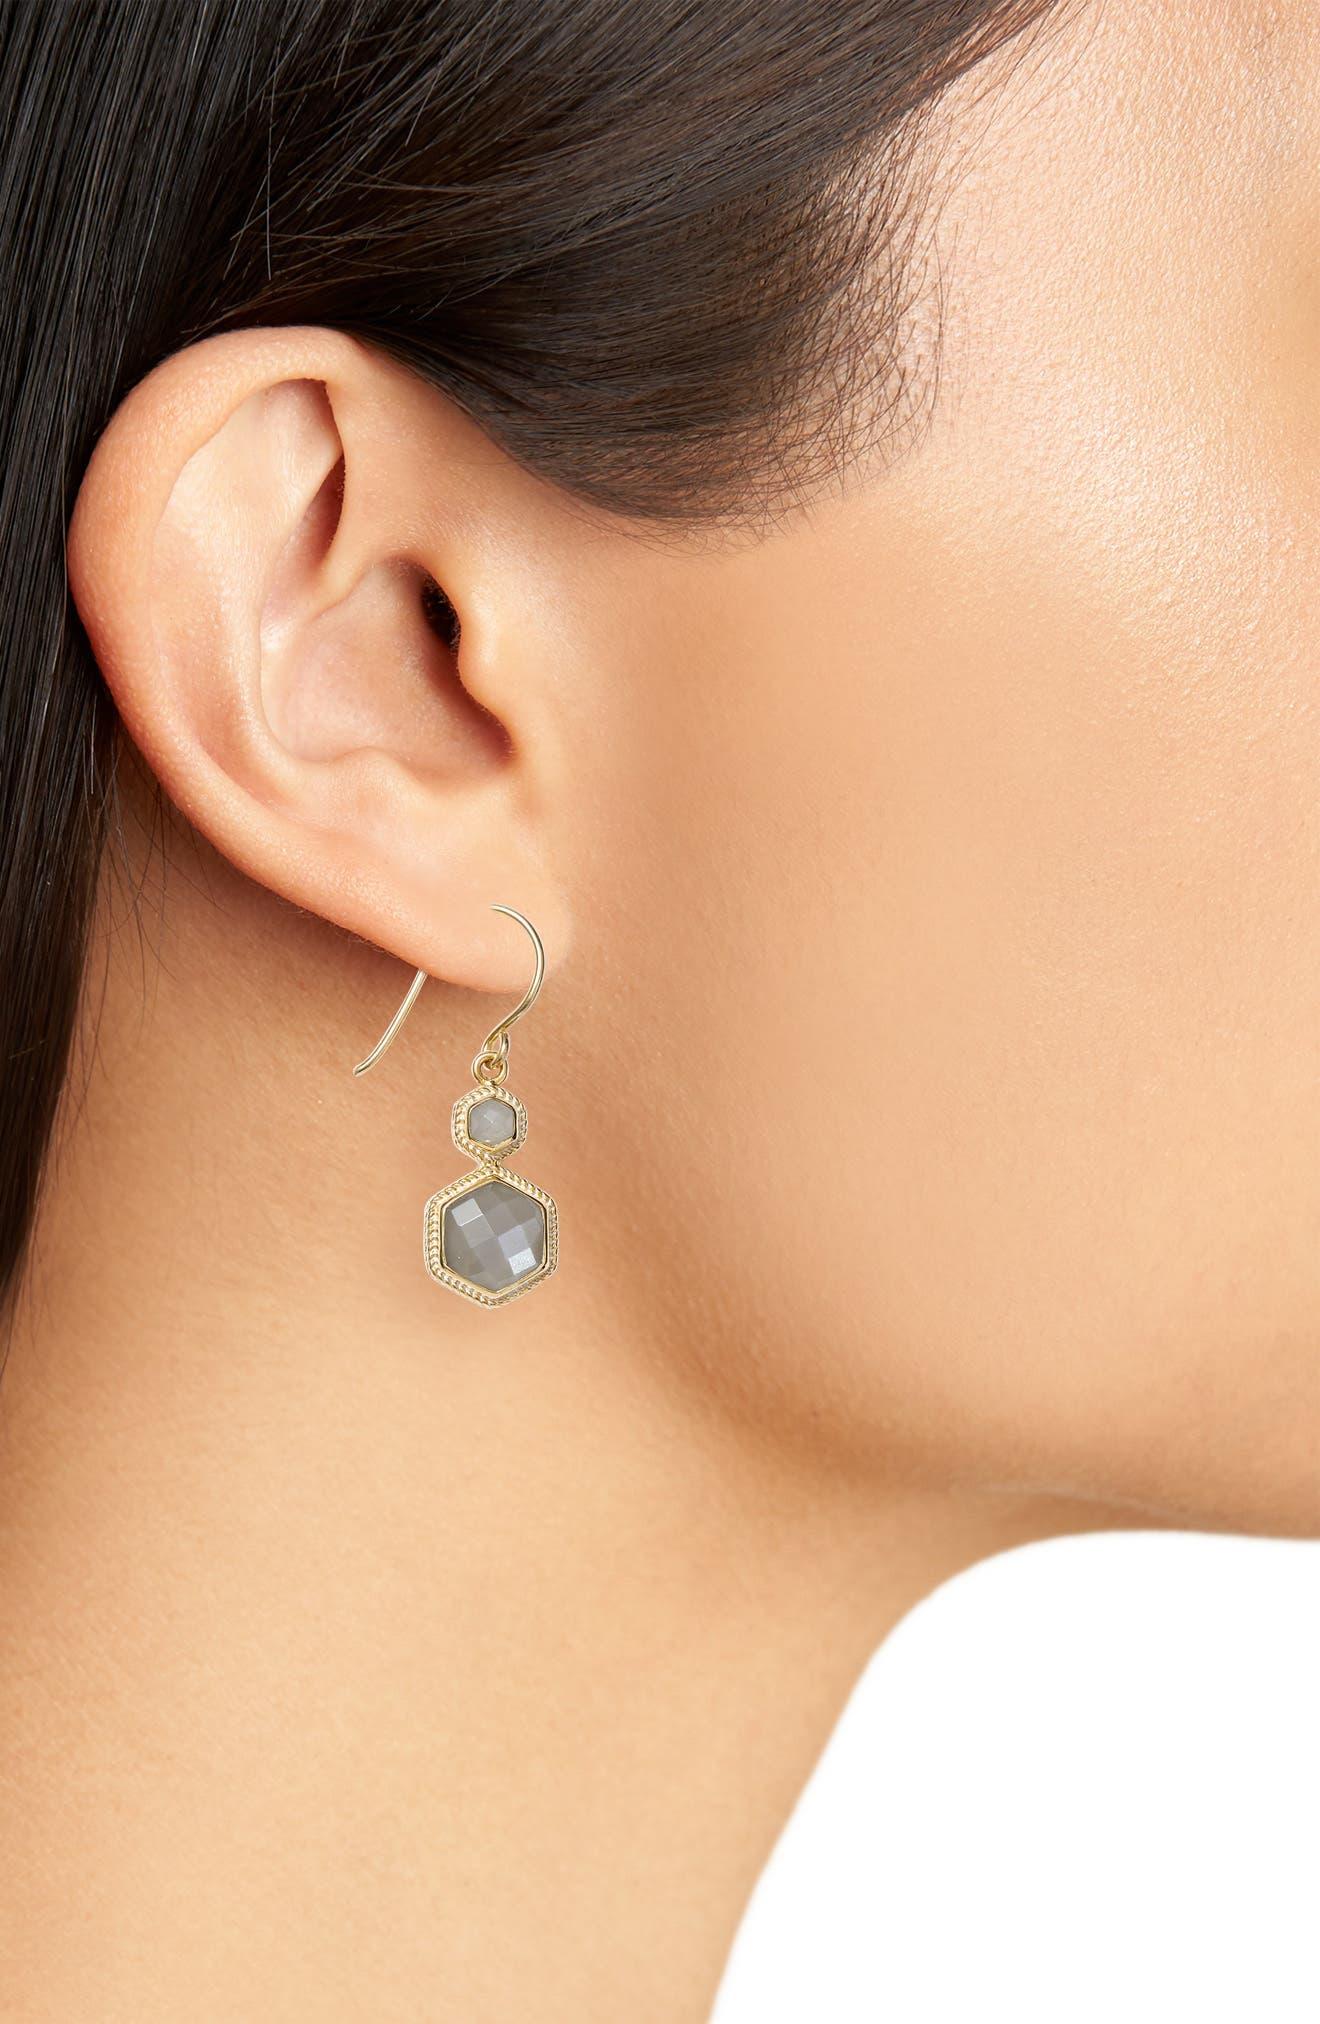 Grey Moonstone Double Drop Earrings,                             Alternate thumbnail 2, color,                             Gold/ Grey Moonstone